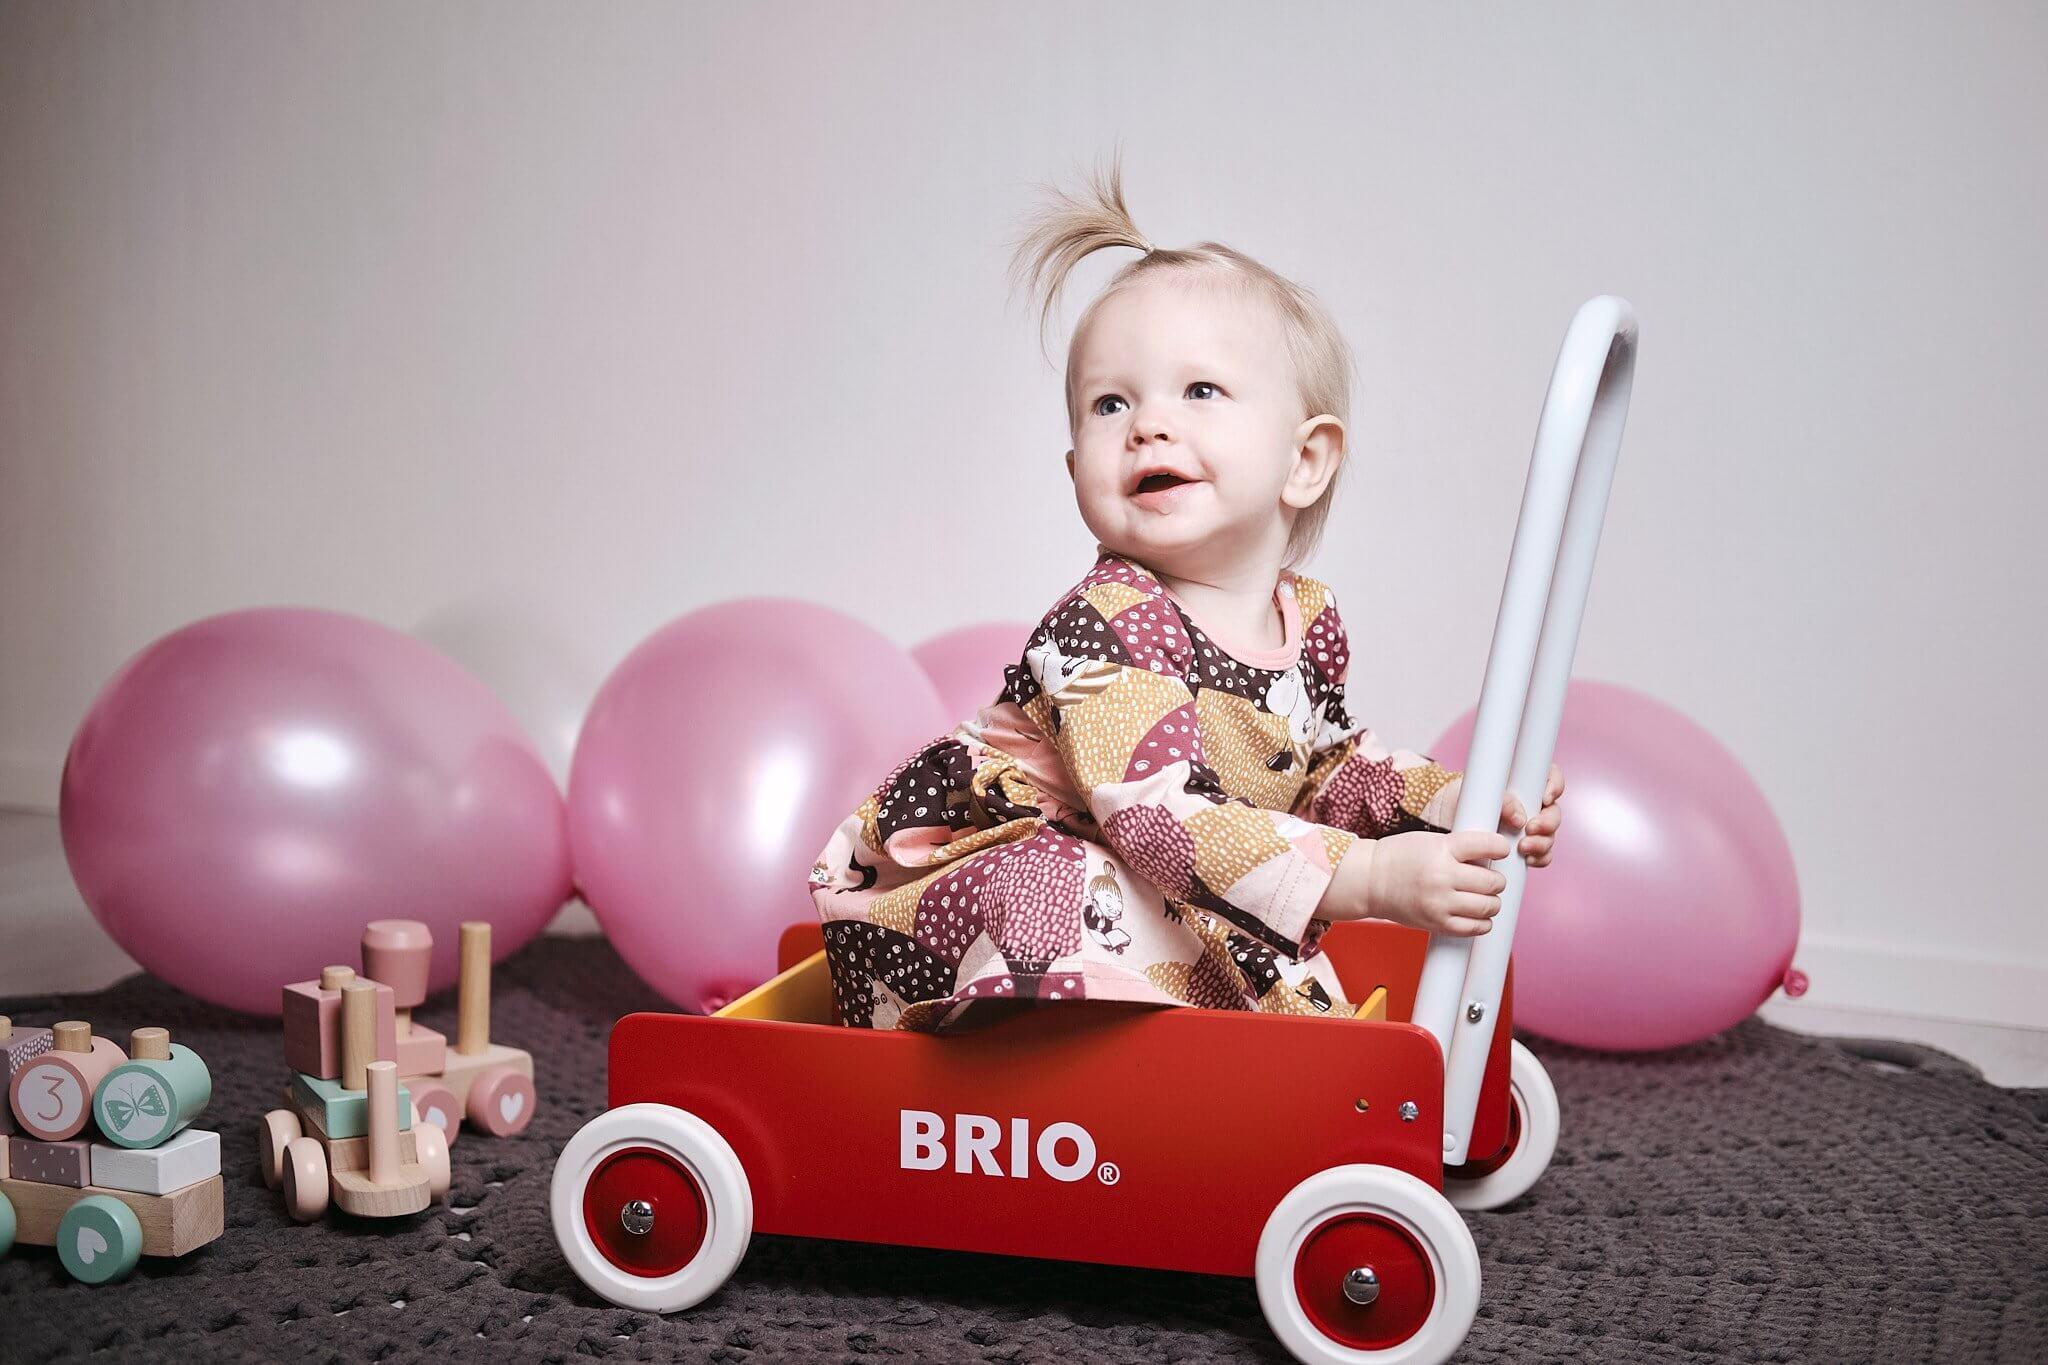 hinnasto lapsikuvaus minea kinnula jyväskylä keskisuomi brio vaunu